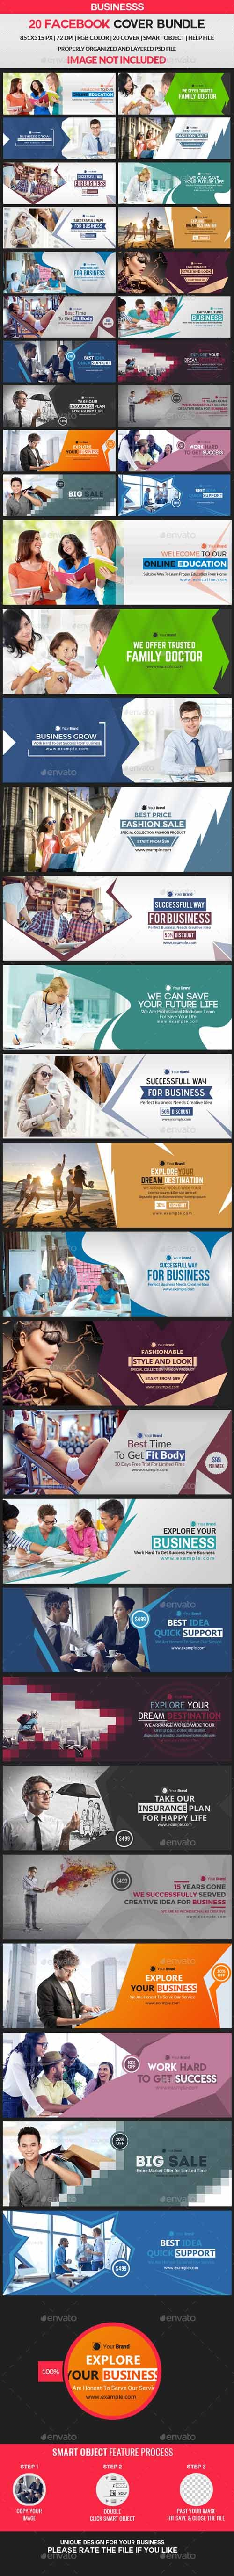 GraphicRiver Facebook Cover Bundle 20 Design 21324005 Free Download